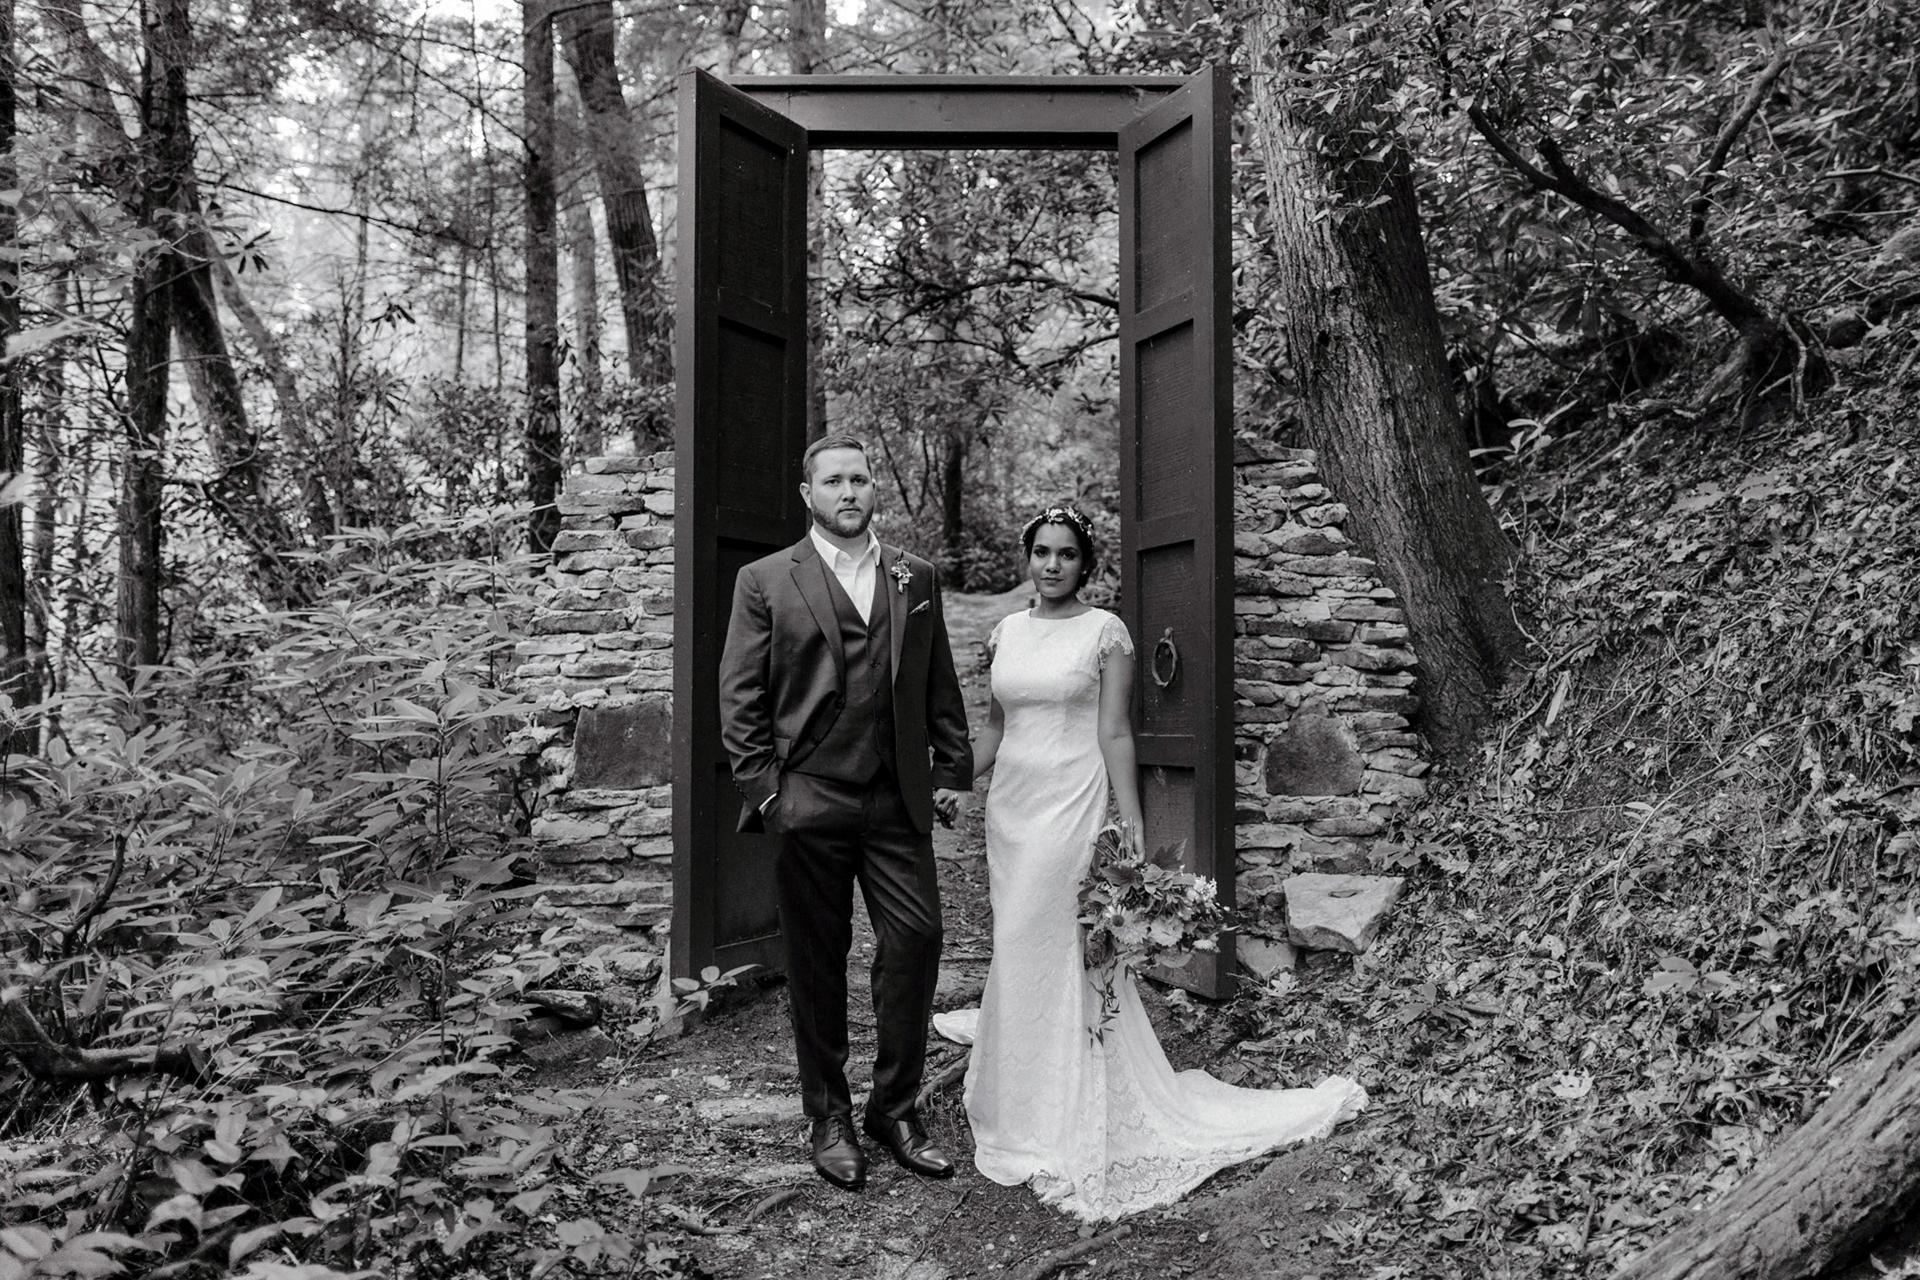 secret-waters-wedding-woods-couple